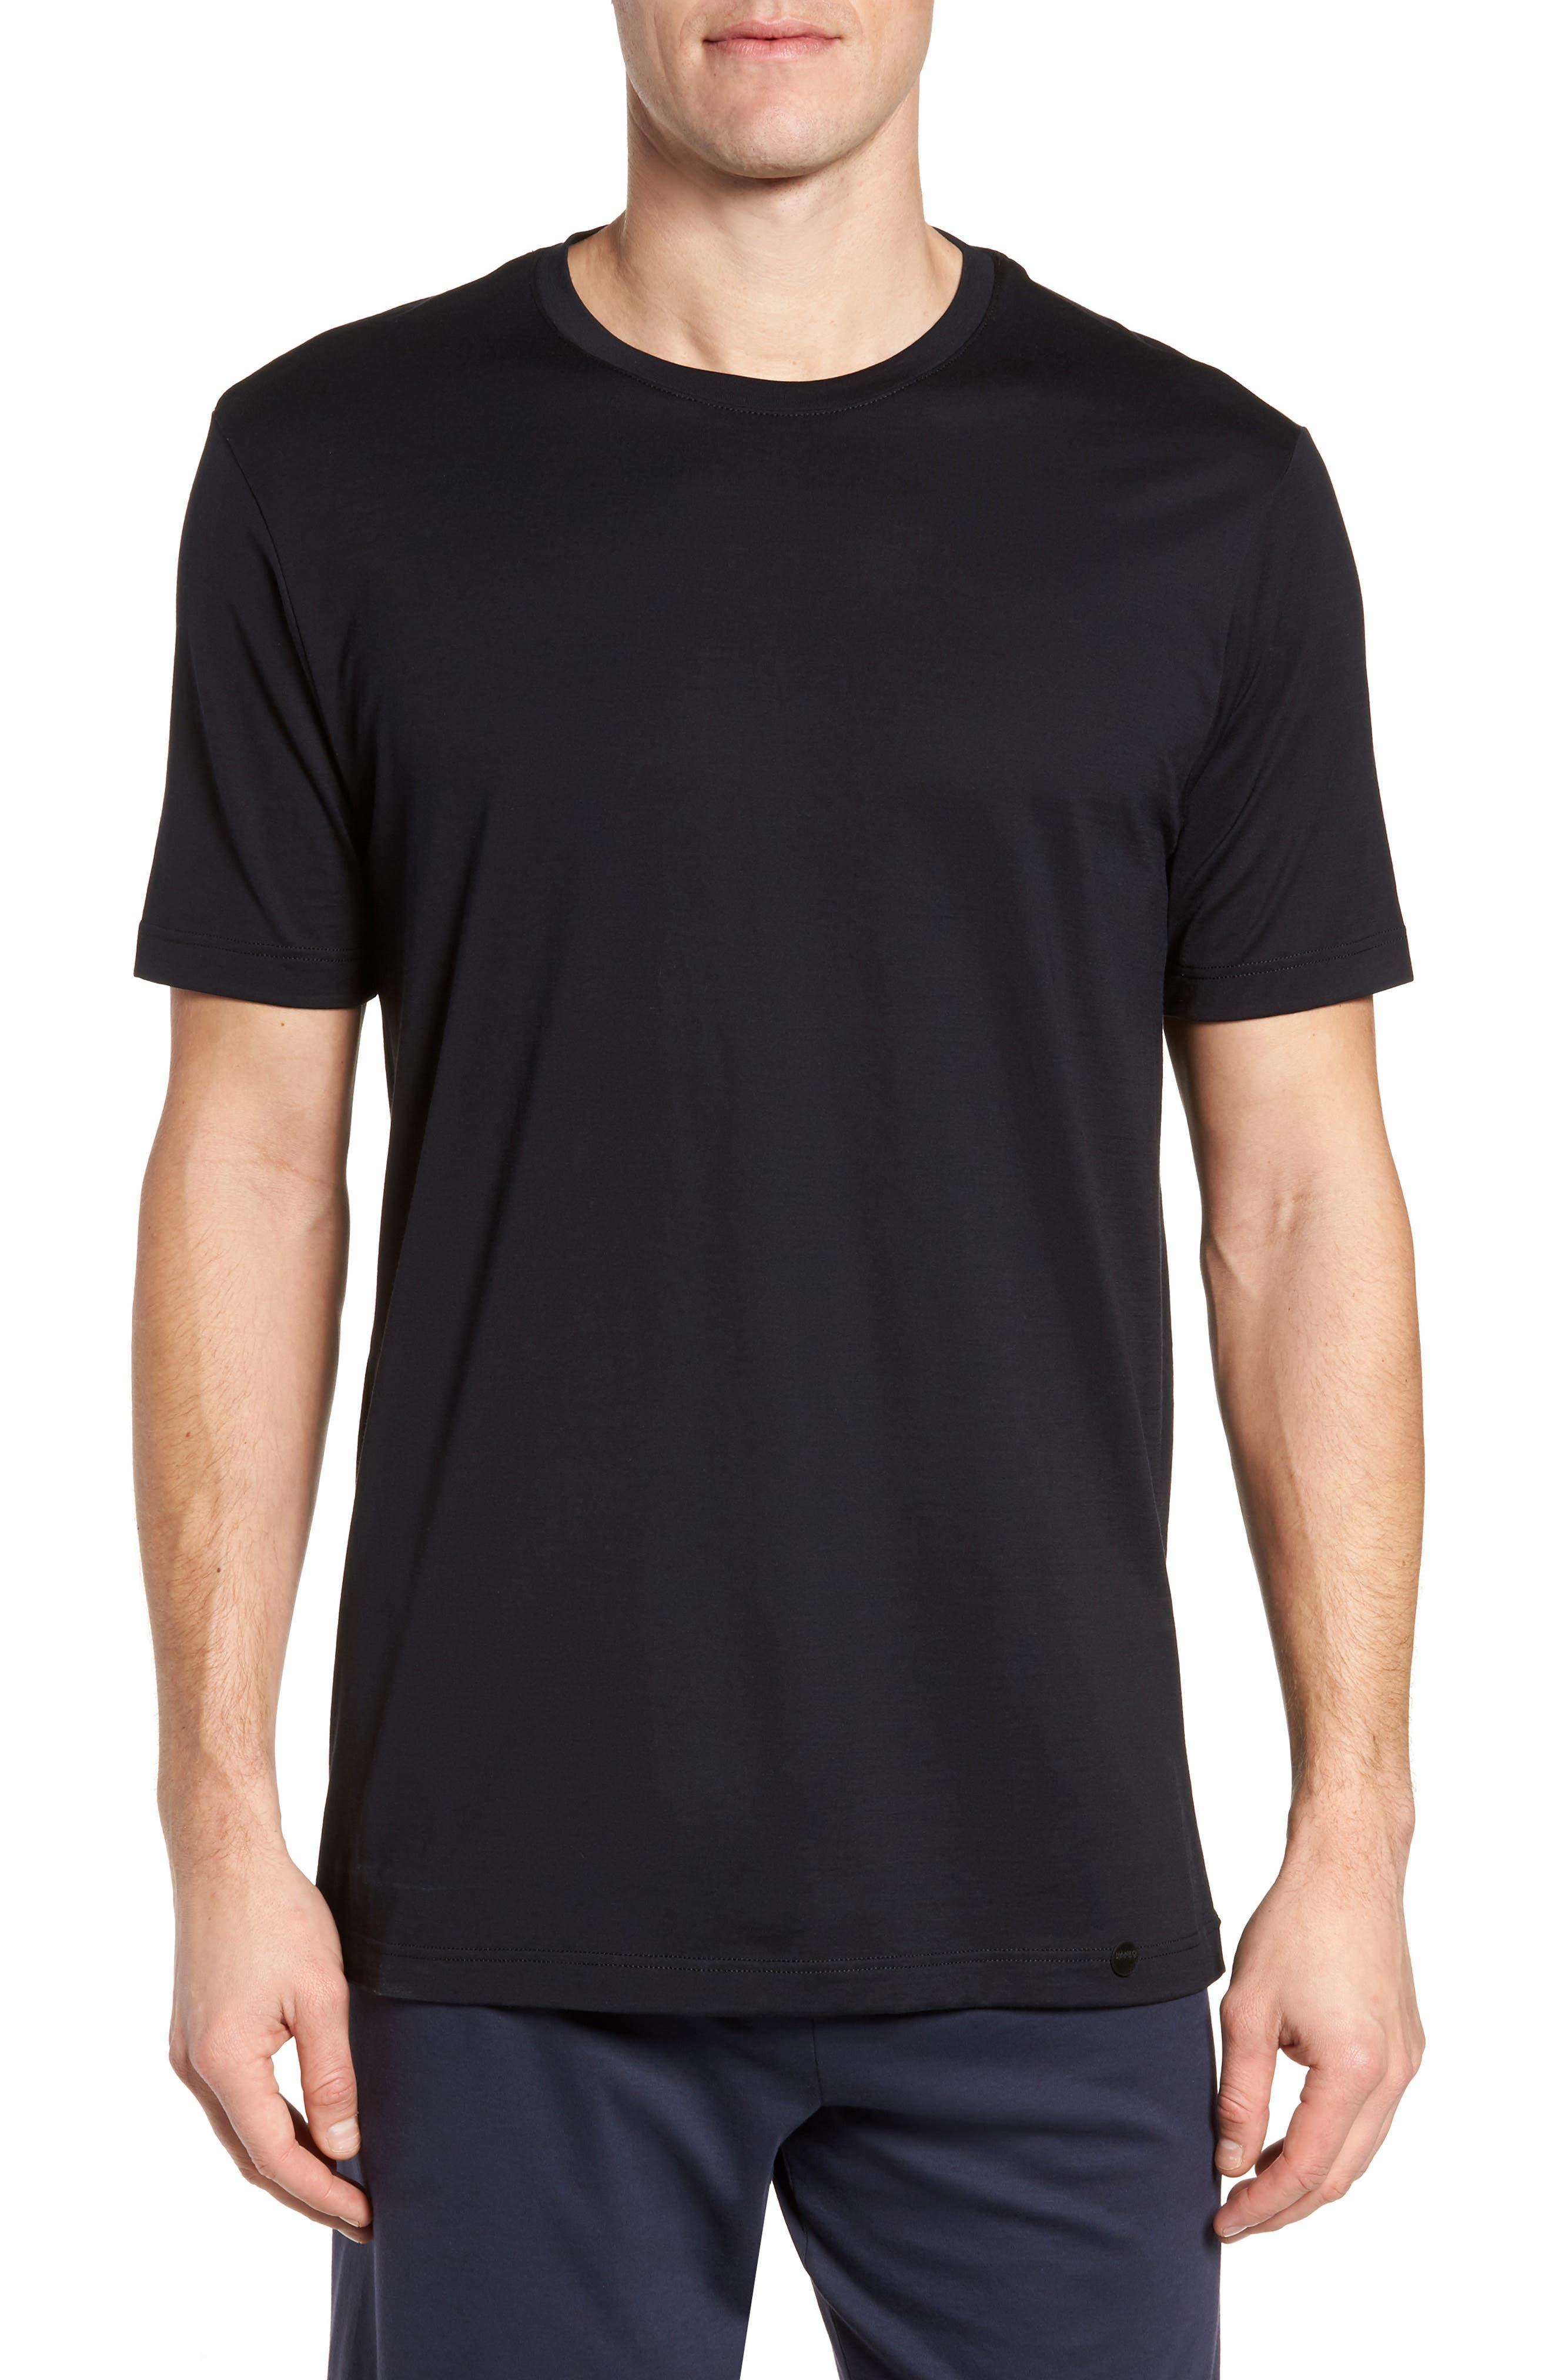 Night & Day Crewneck T-Shirt,                         Main,                         color, BLACK